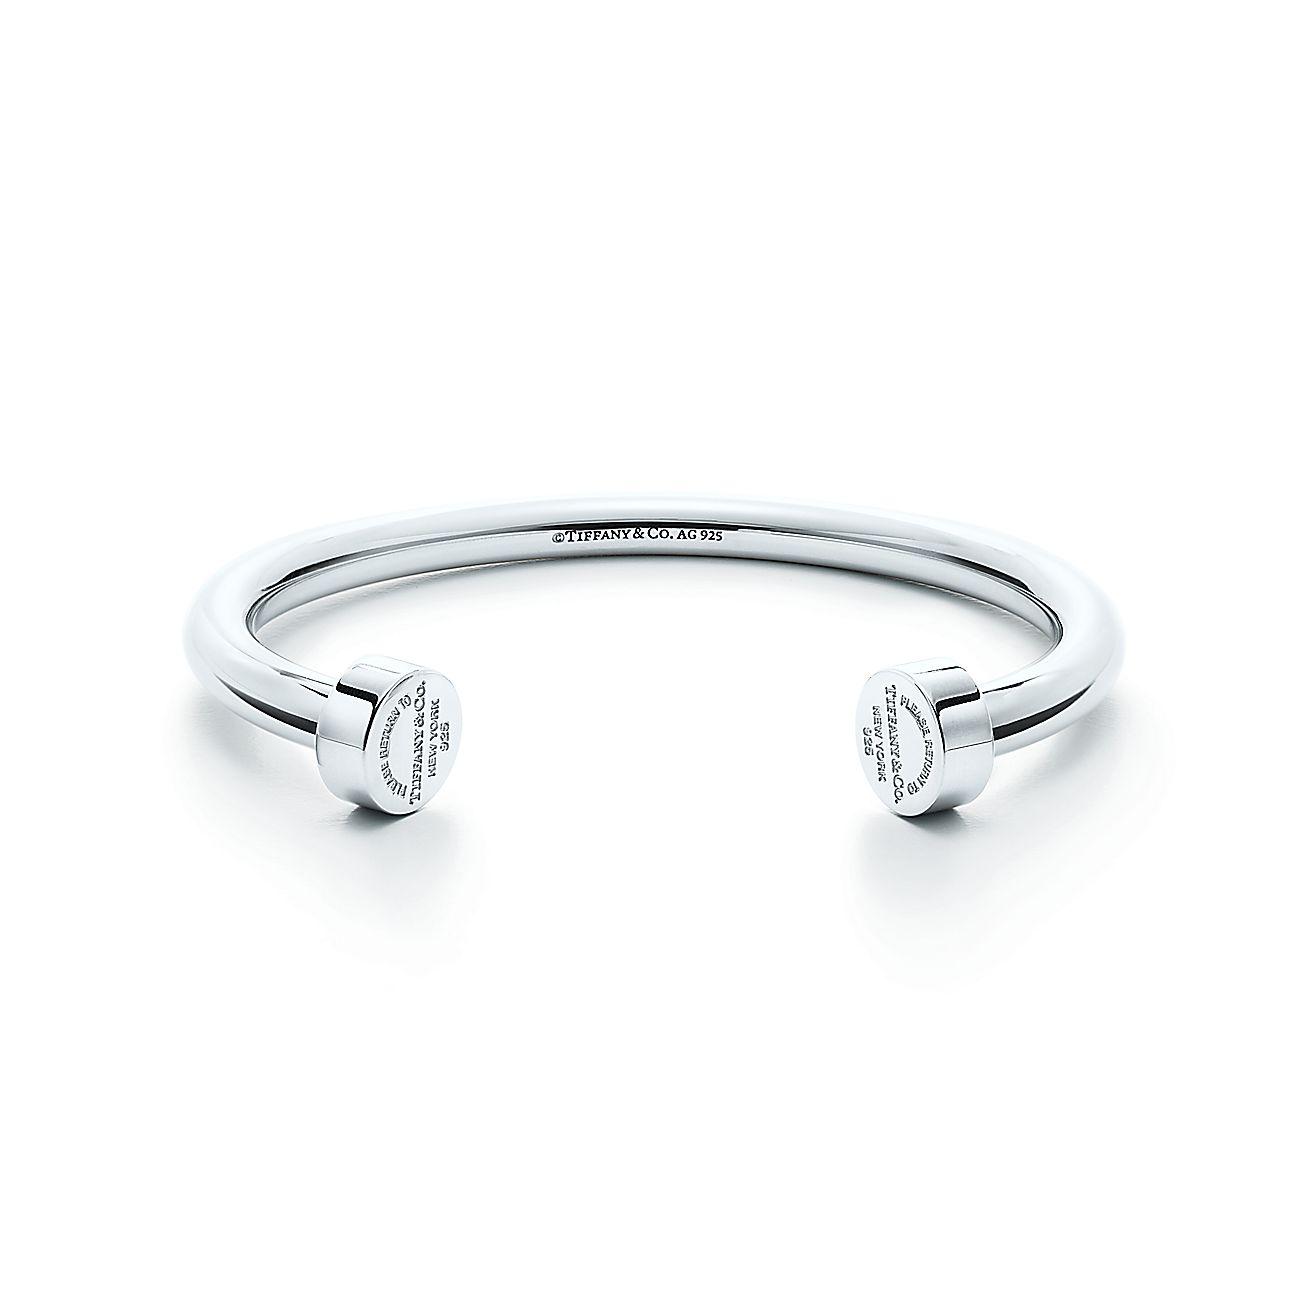 Return to Tiffany™: Armreif mit kreisförmigen Enden